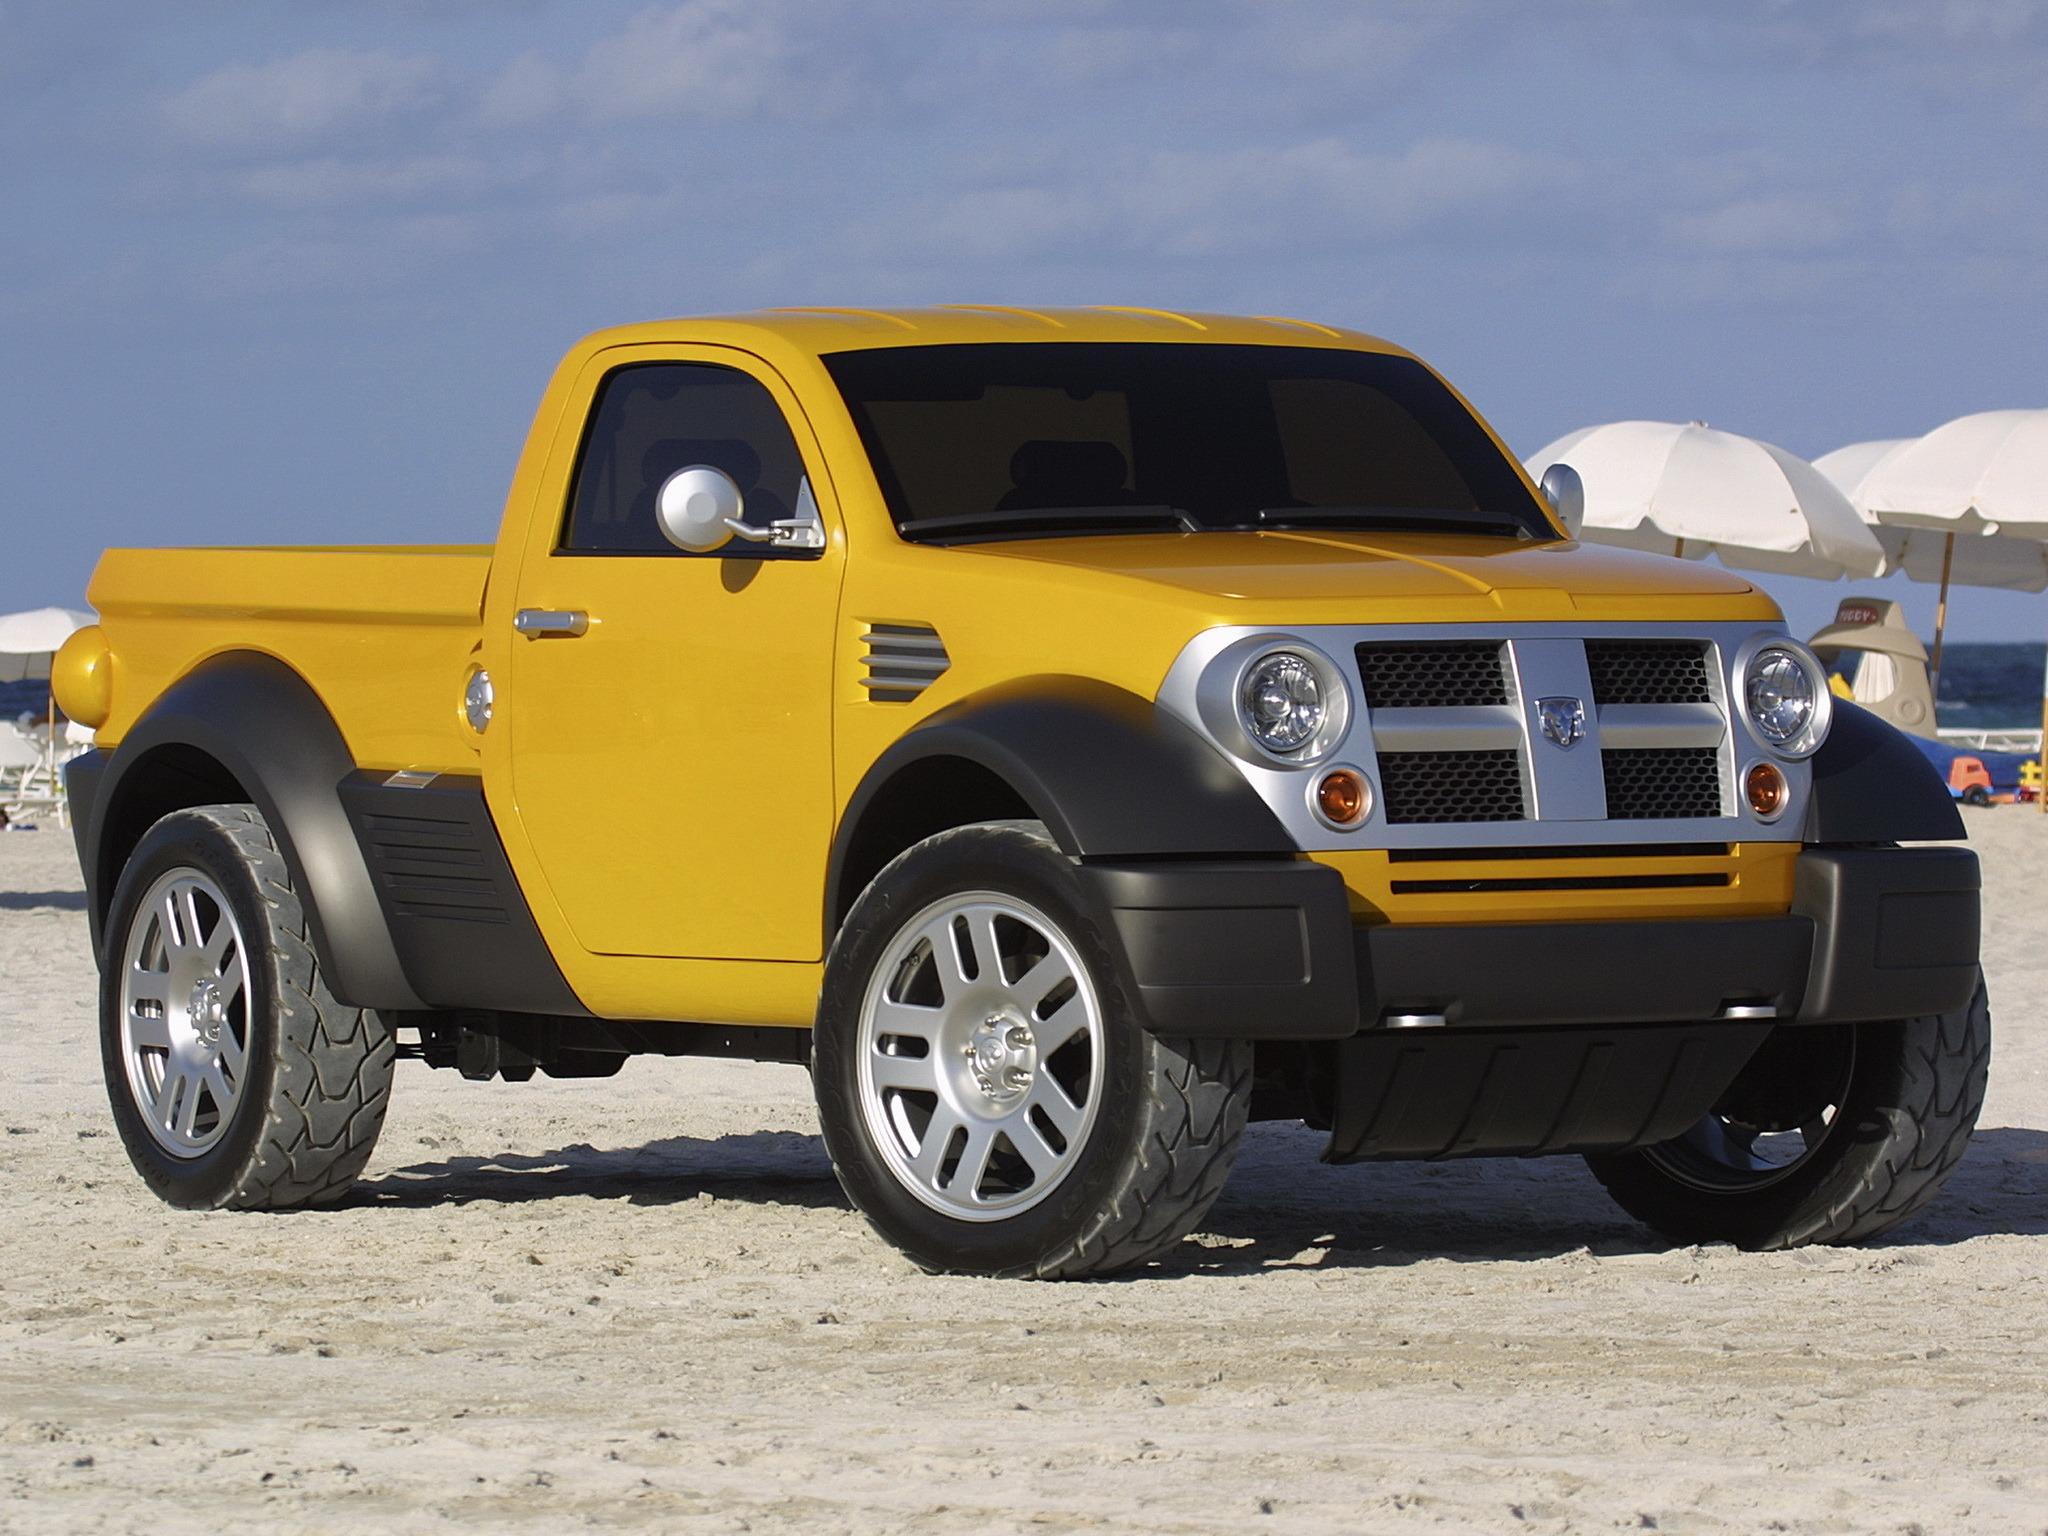 dodge concept m80 2002 pickup trucks jeep chrysler compact ford truck retro concepts dakota ram future engine v6 looks weird